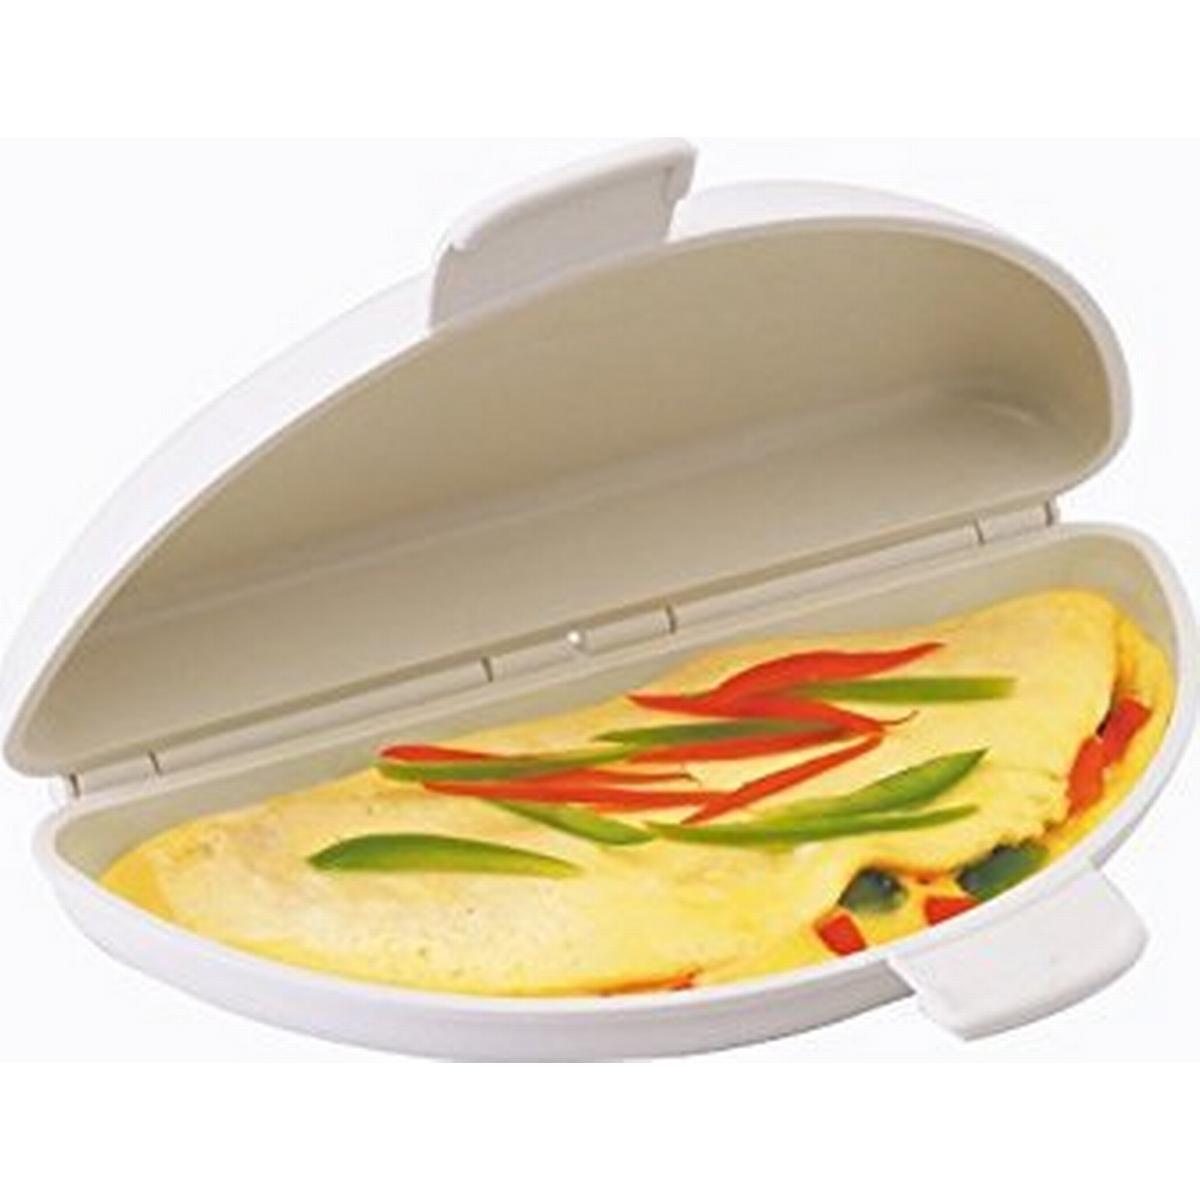 Elgento Non Stick Omelette Maker White easy Clean Two Semi circular Omelettes